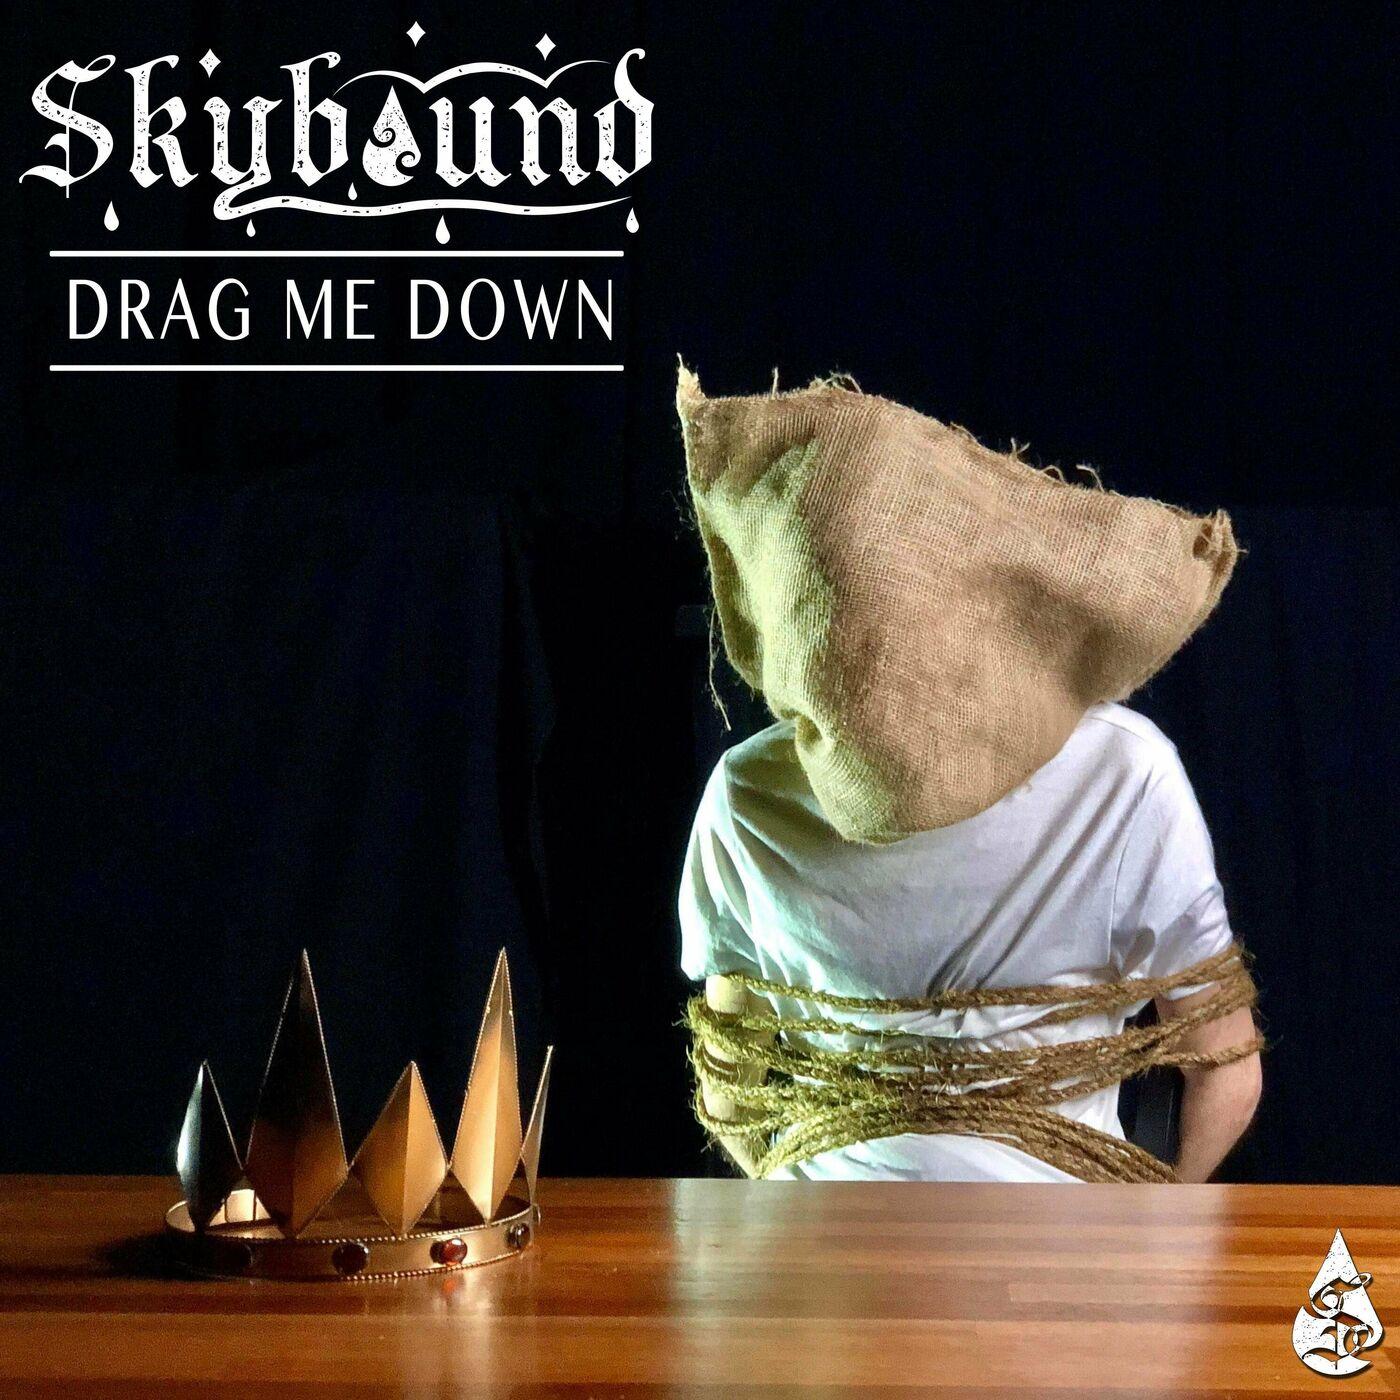 Skybound - Drag Me Down [single] (2020)